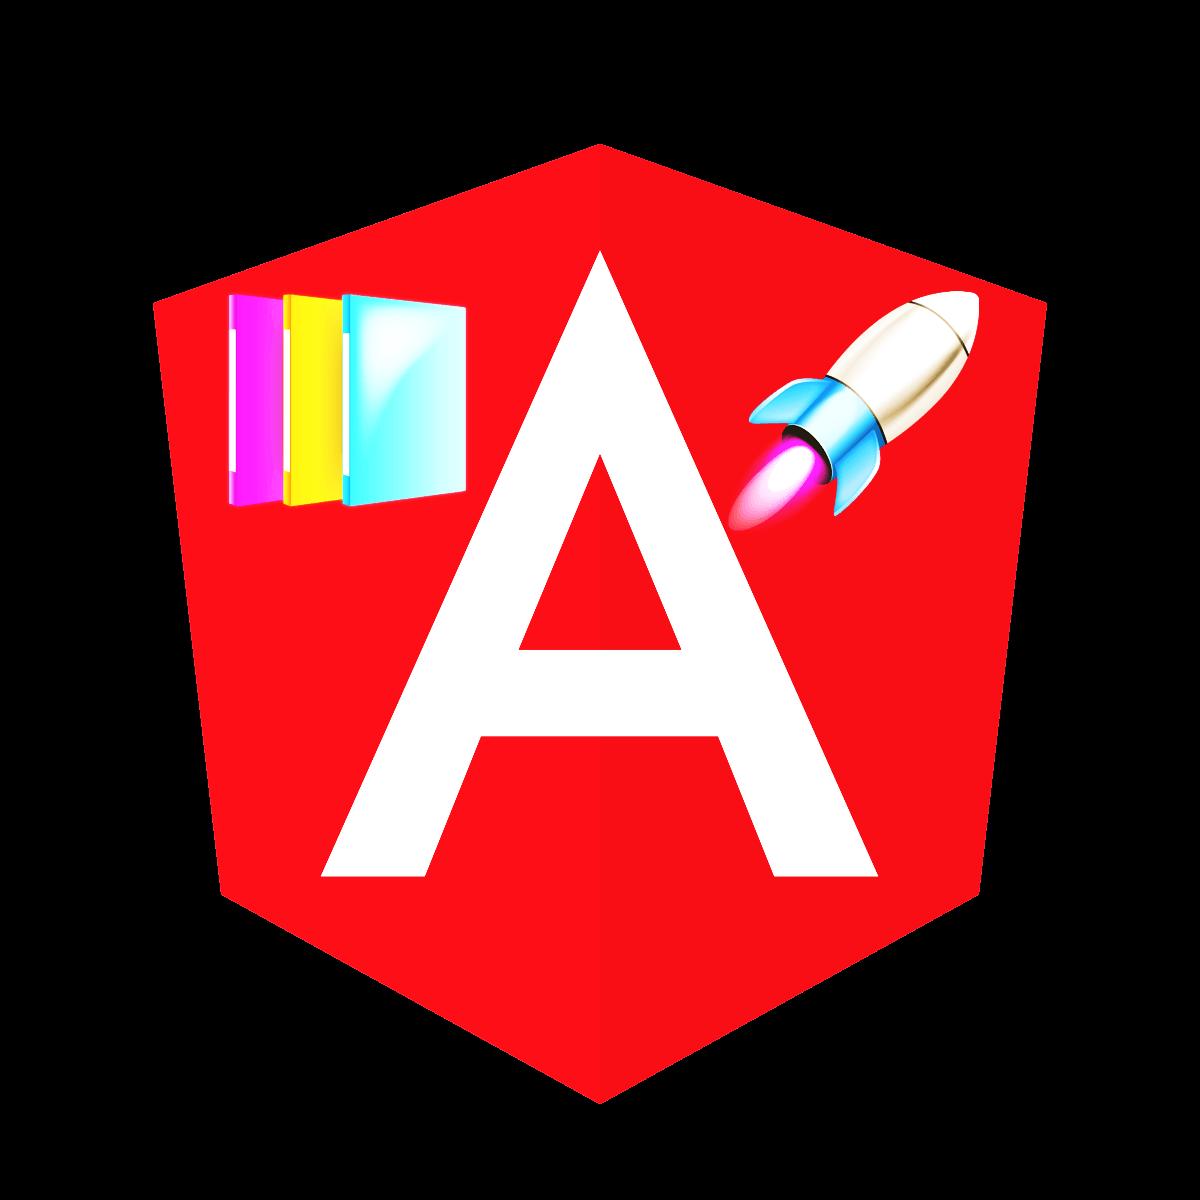 send file in angular 9